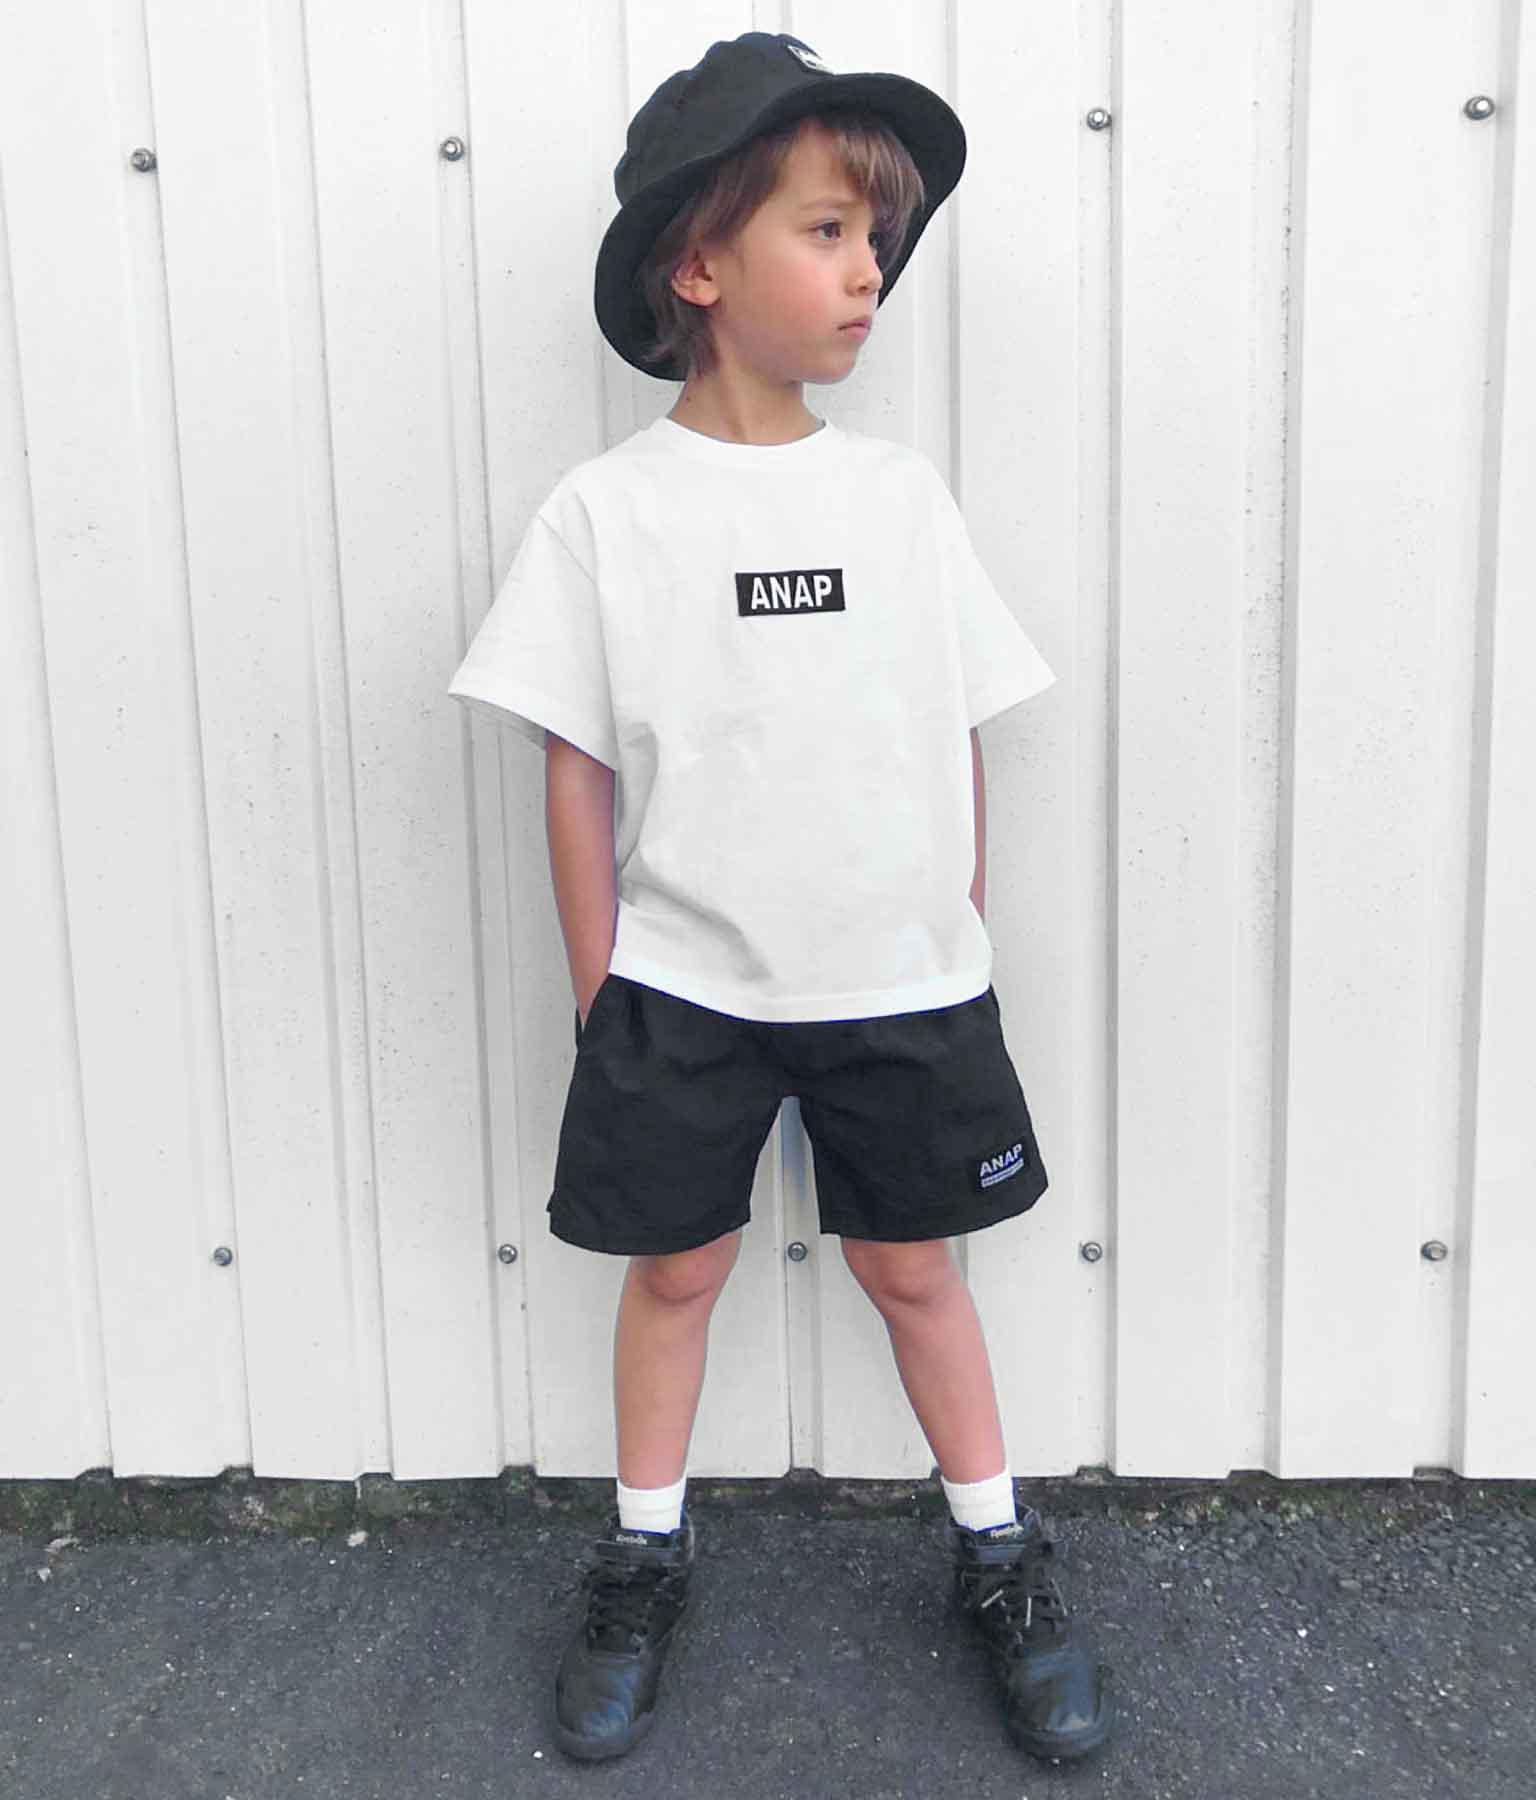 ANAPロゴ刺繍ビッグTシャツ   ANAP KIDS